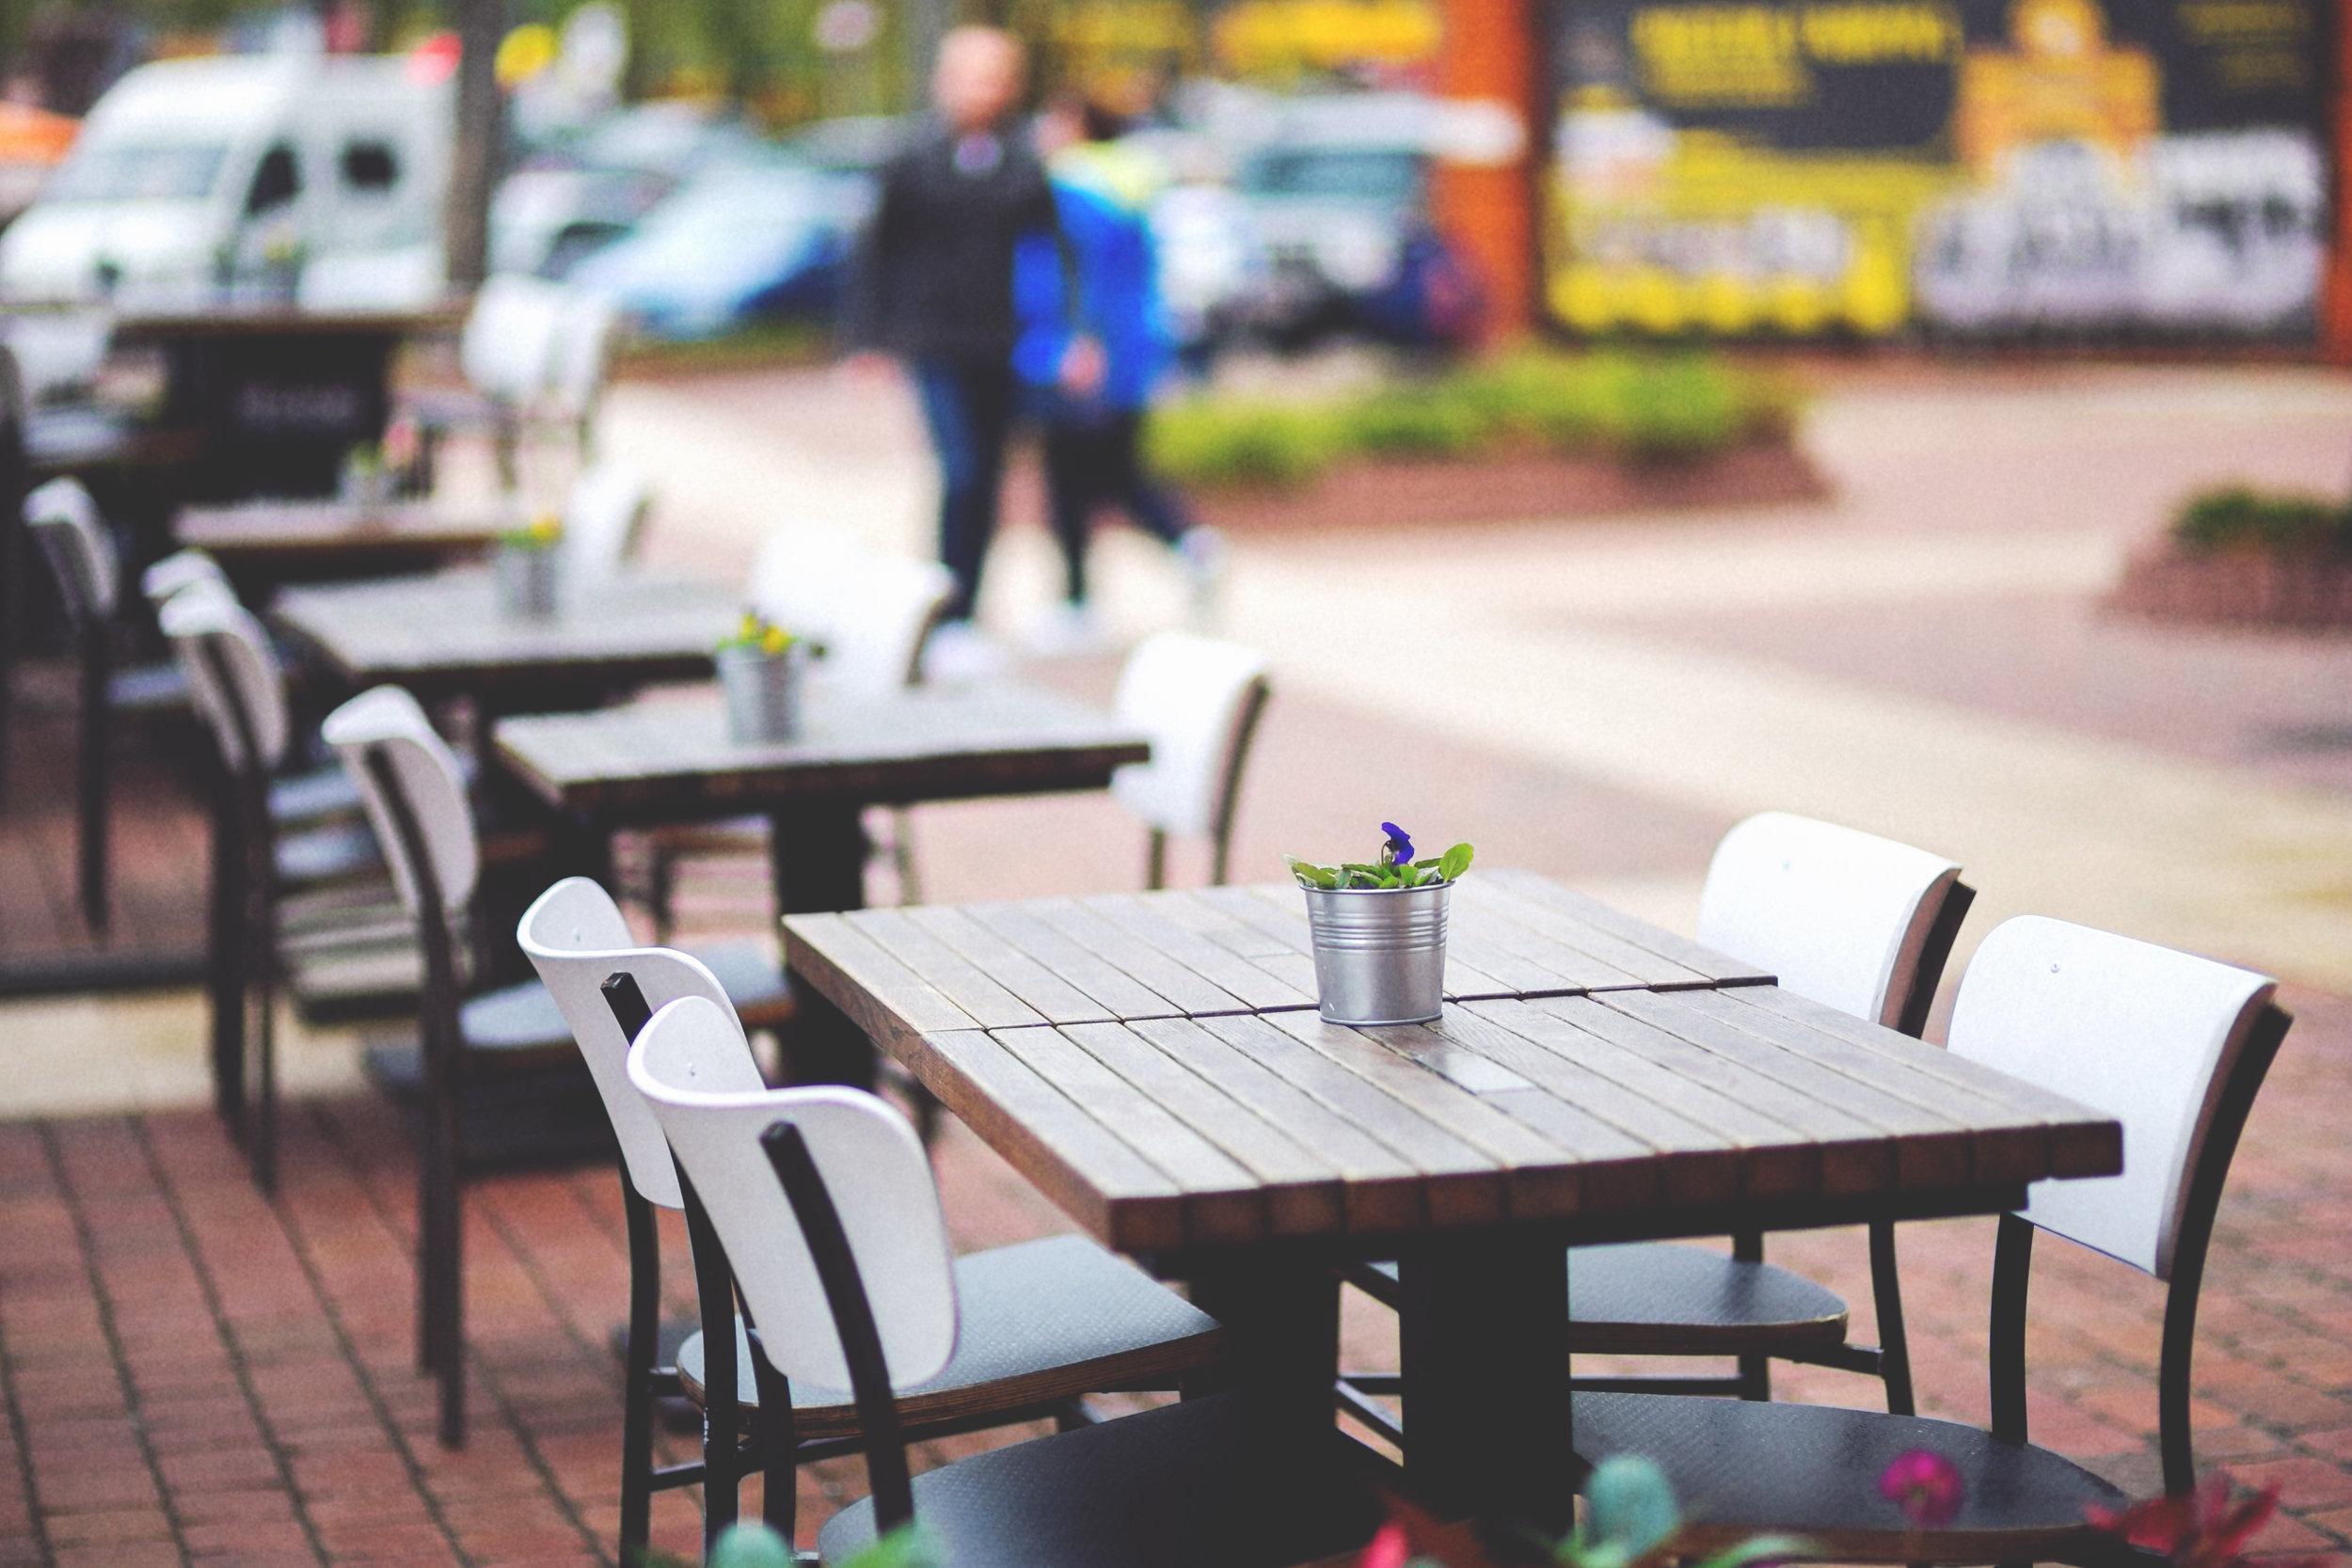 marketingtipsforrestaurants